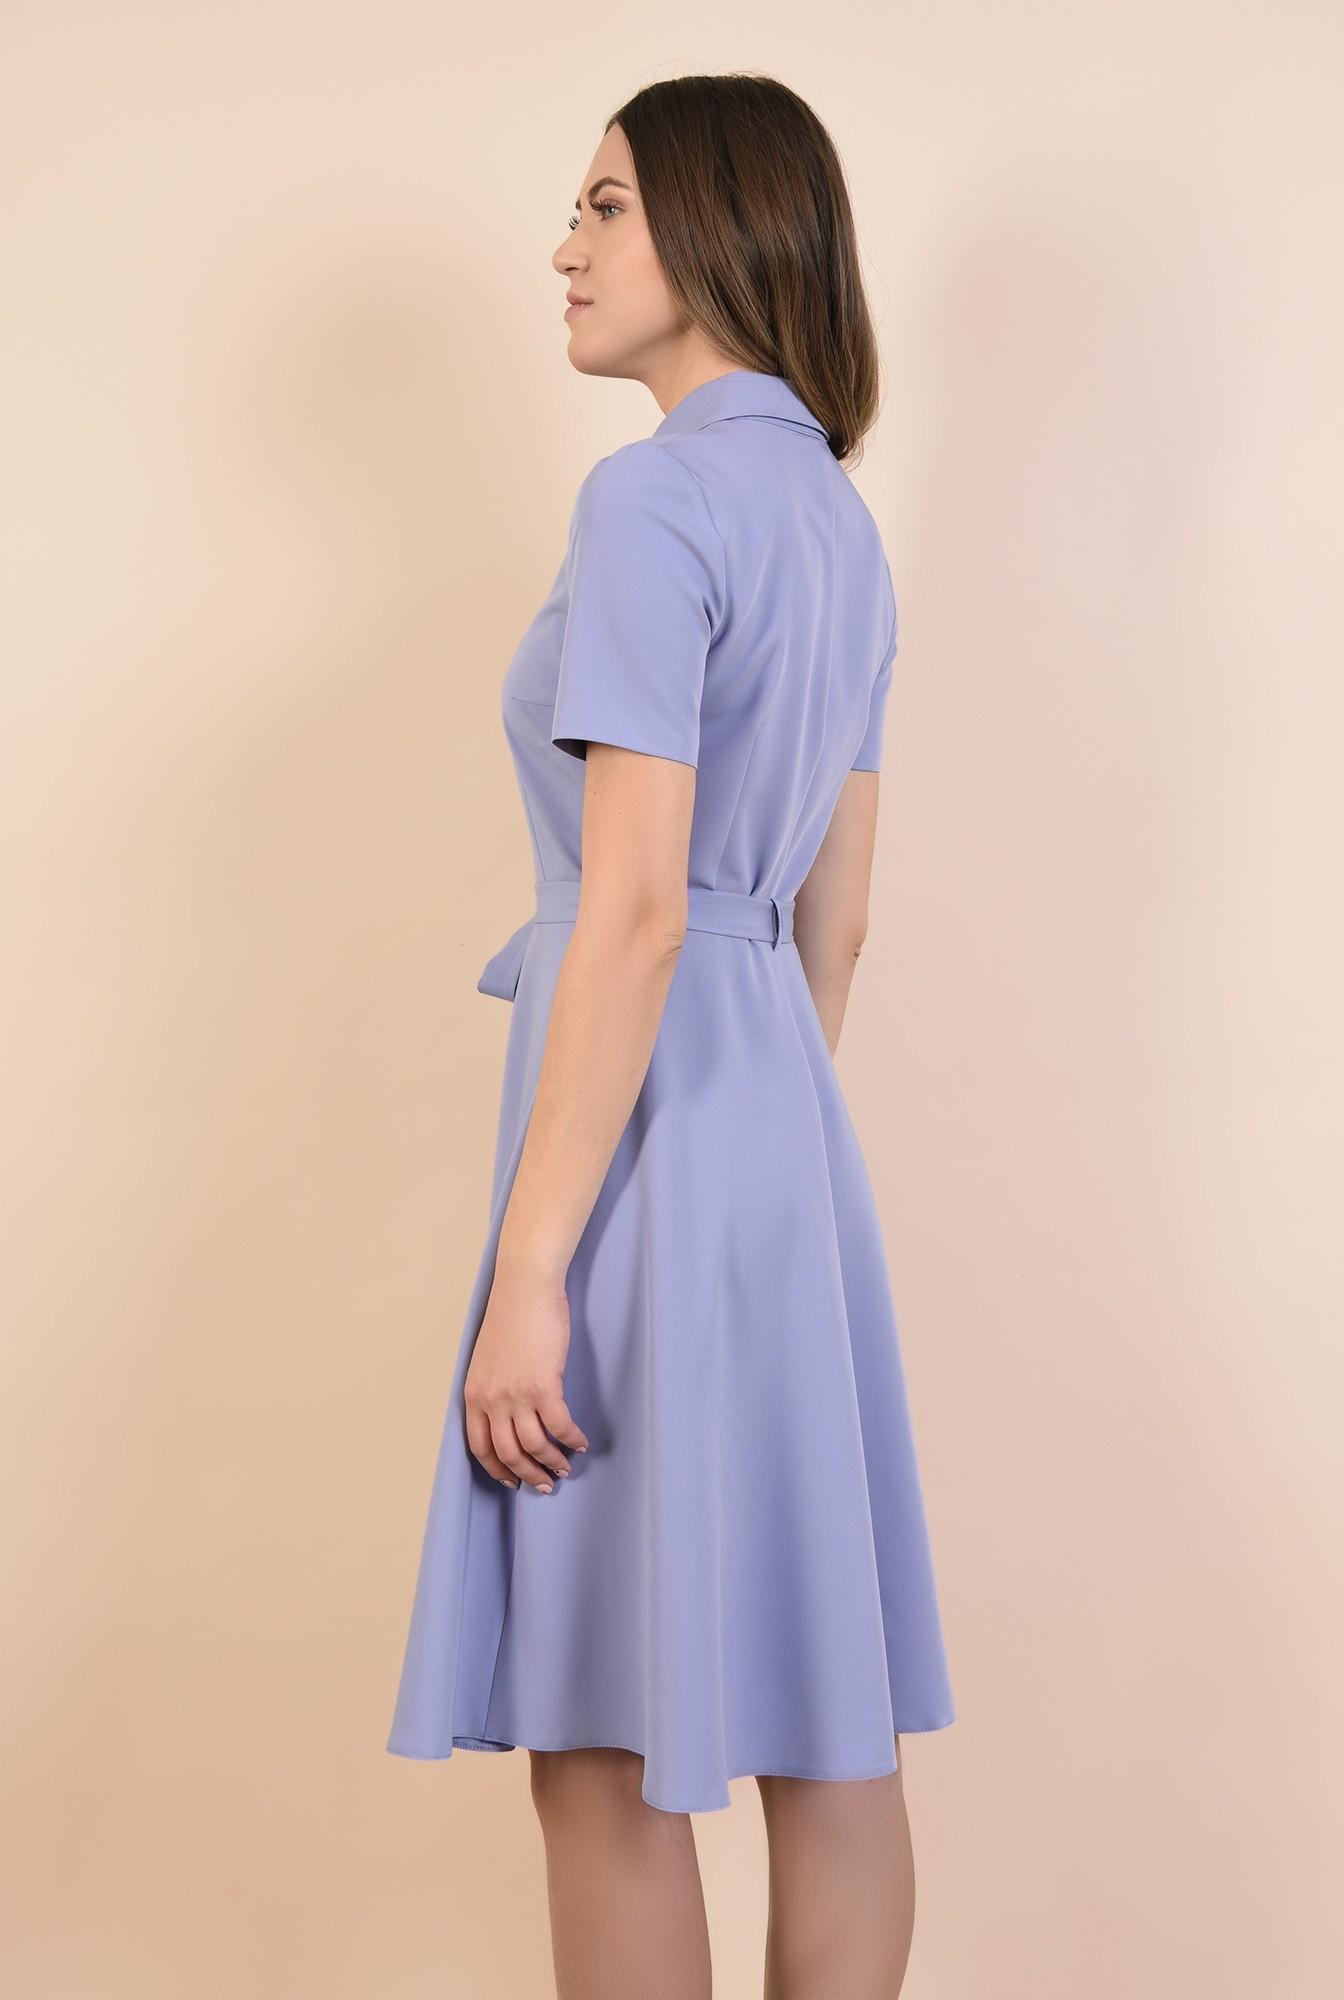 1 - rochie lila, de zi, evazata, midi, inchidere cu nasturi asortati